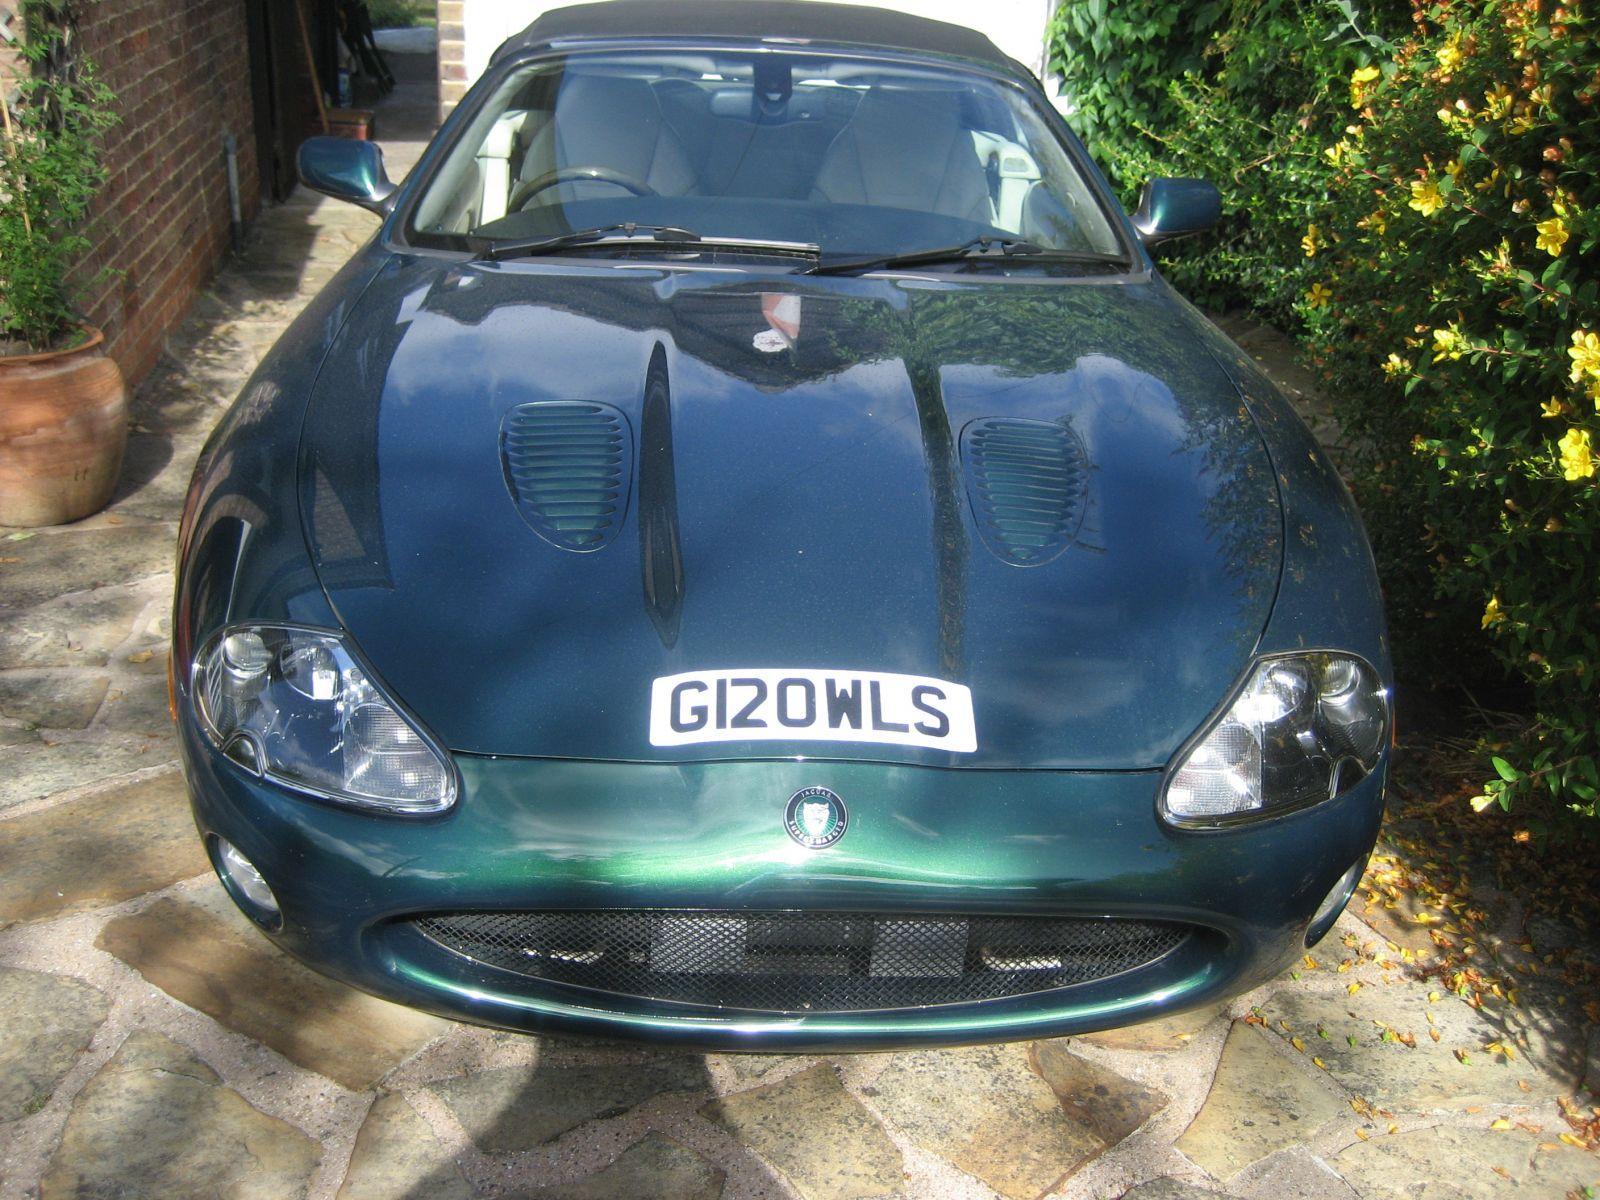 growls g120wls  for sale £3000 07836353108 richardhearn57@hotmail.com